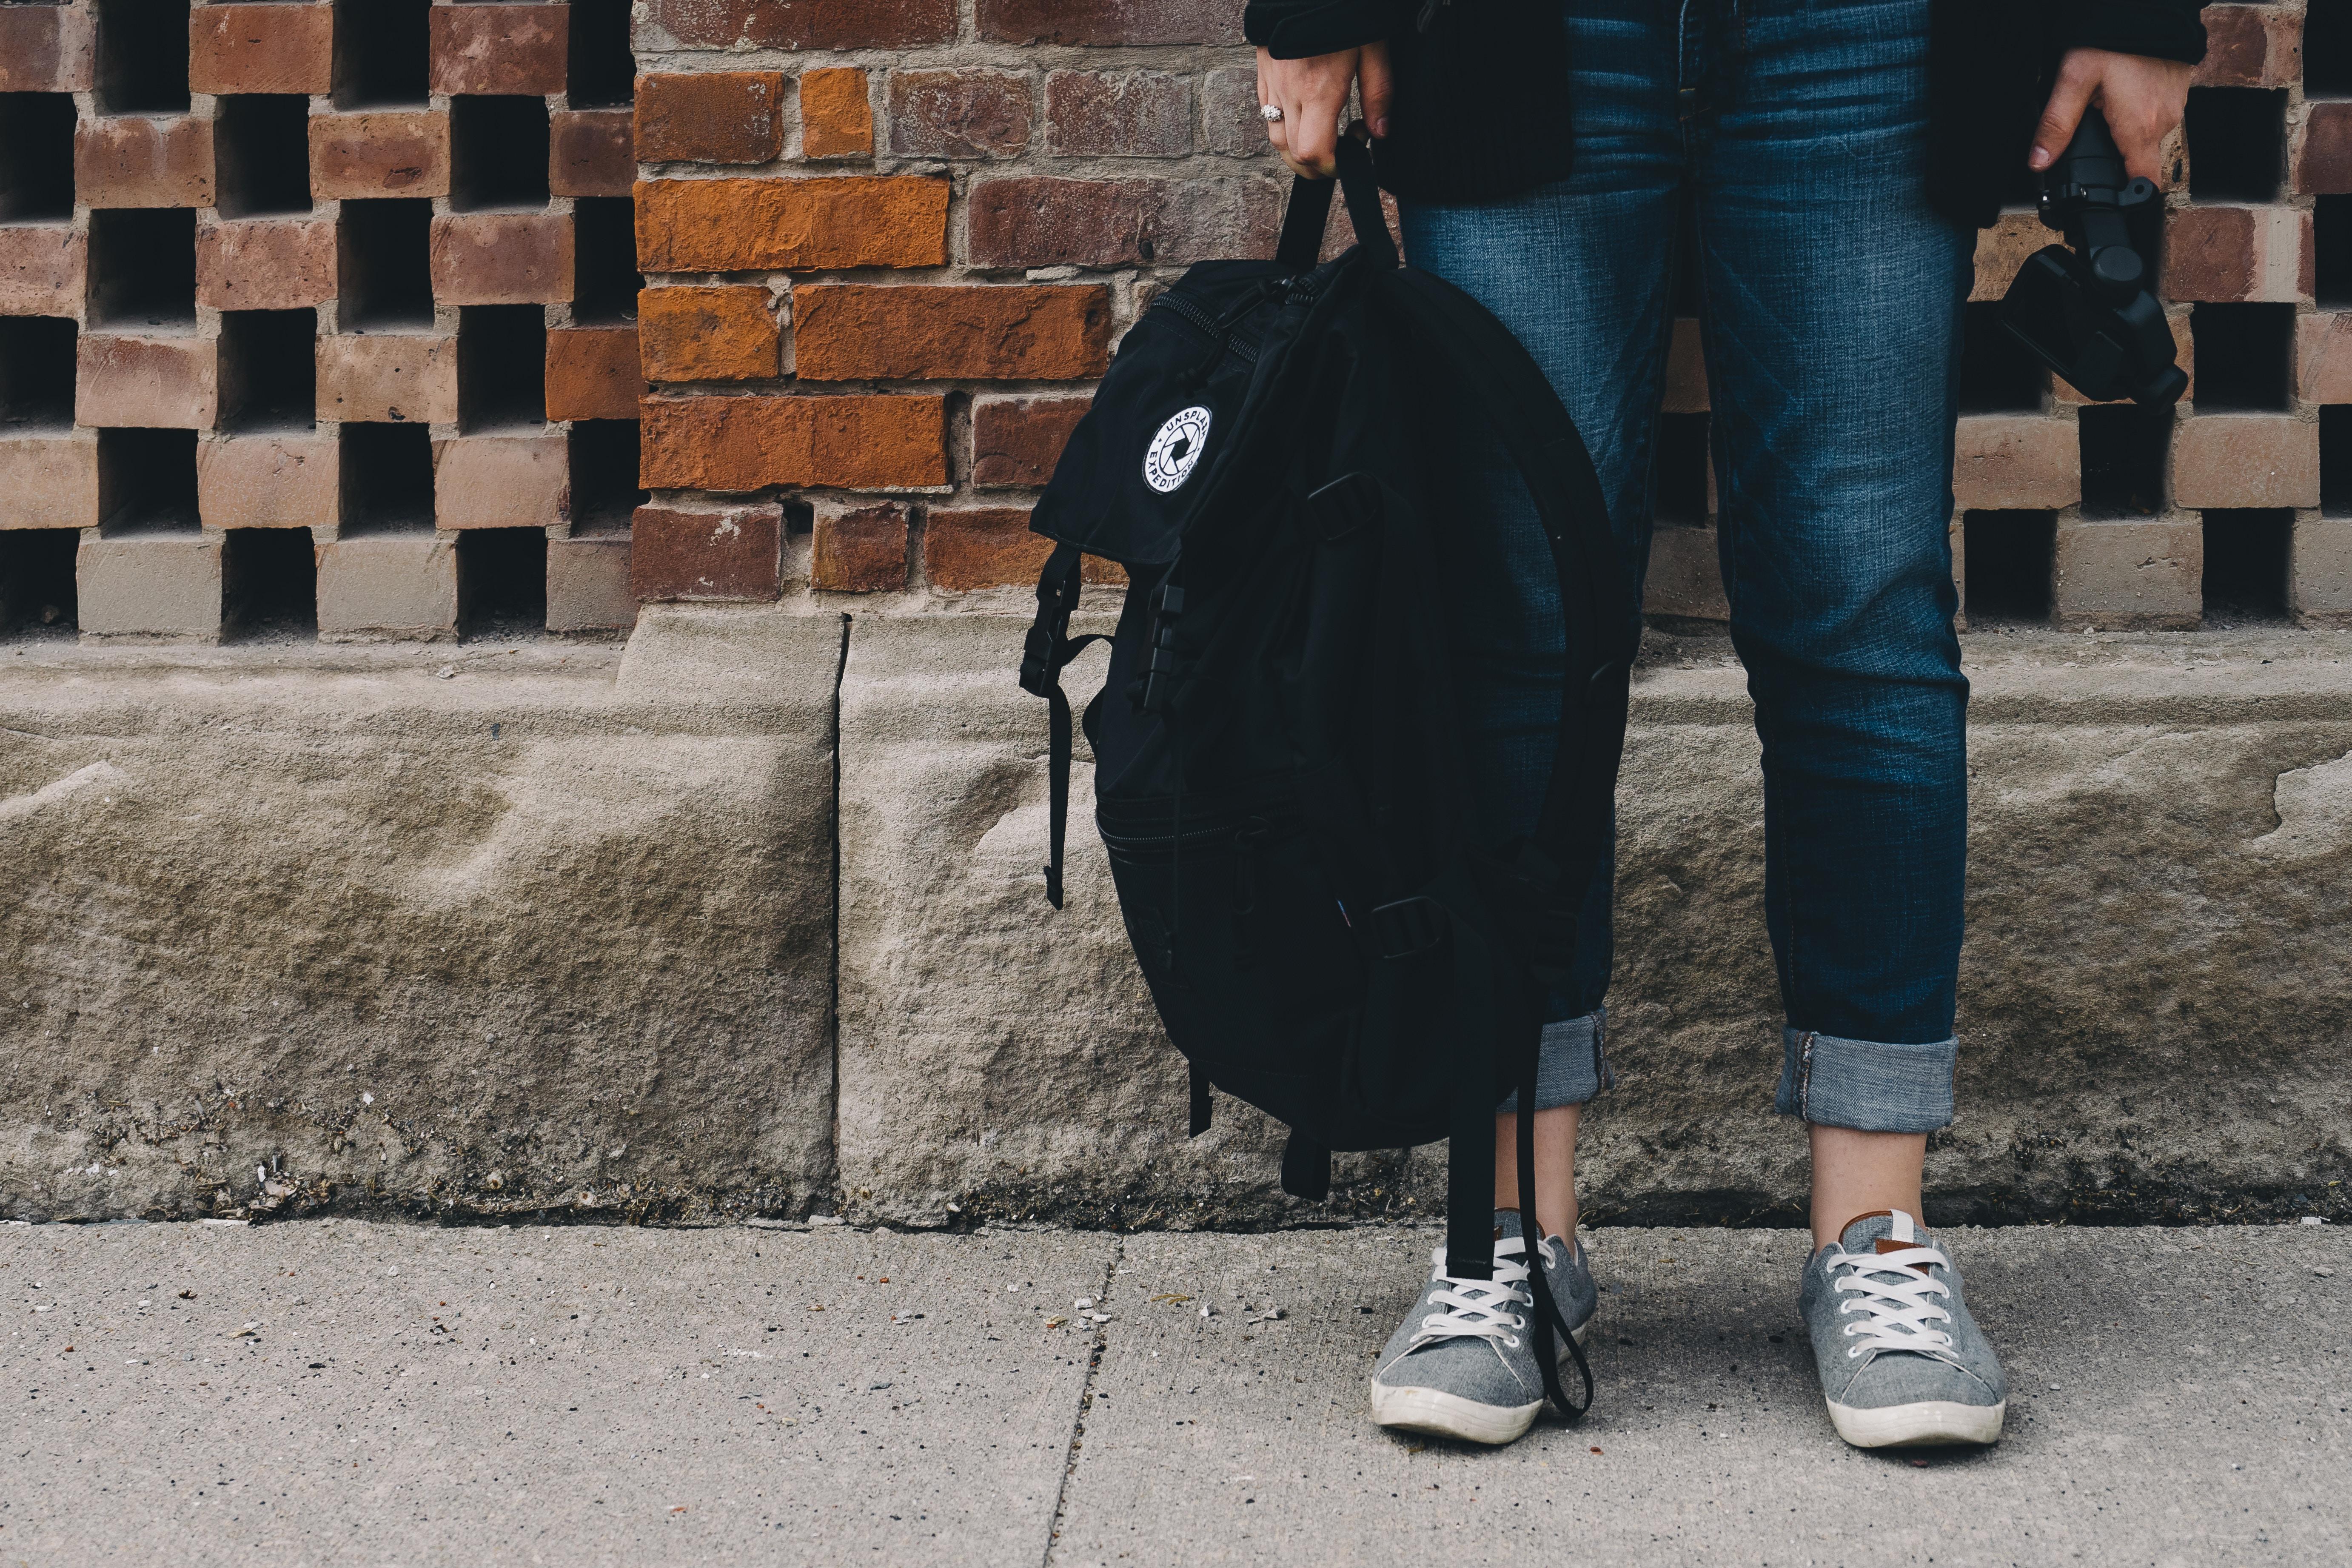 backpack, student, brick wall, unsplash